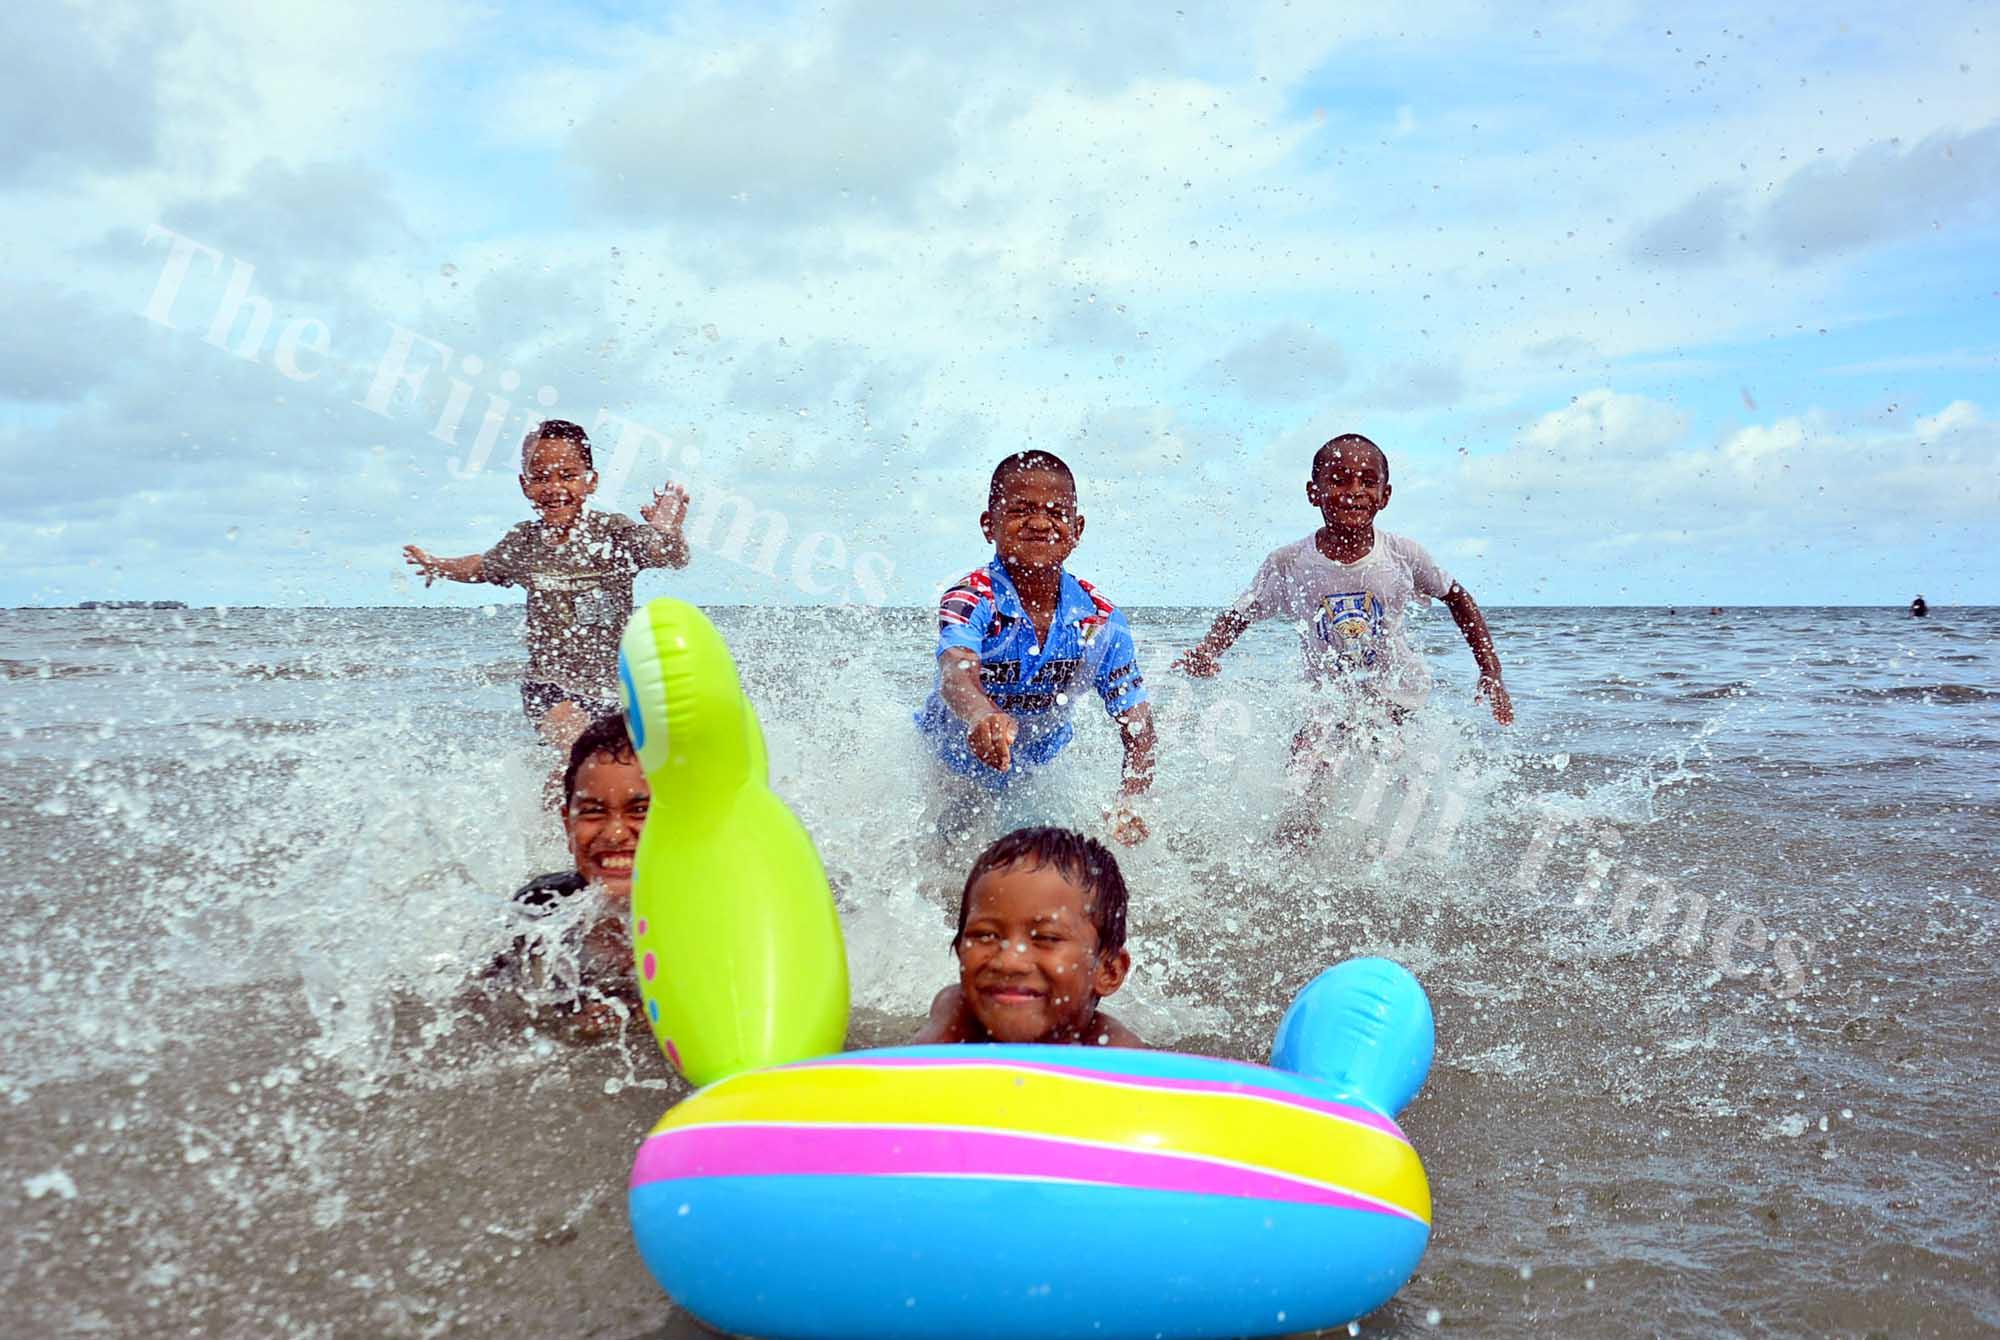 Children from left, John Turaganivalu, 6, David Apenisa, 9, Peter Ledua, 6, Mosese Rasaqa, 9, and Josaia Rakai, 6, enjoy their dayout at the beach at My Suva Picnic Park on Wednesday, January 10, 2018. Picture: JONACANI LALAKOBAU